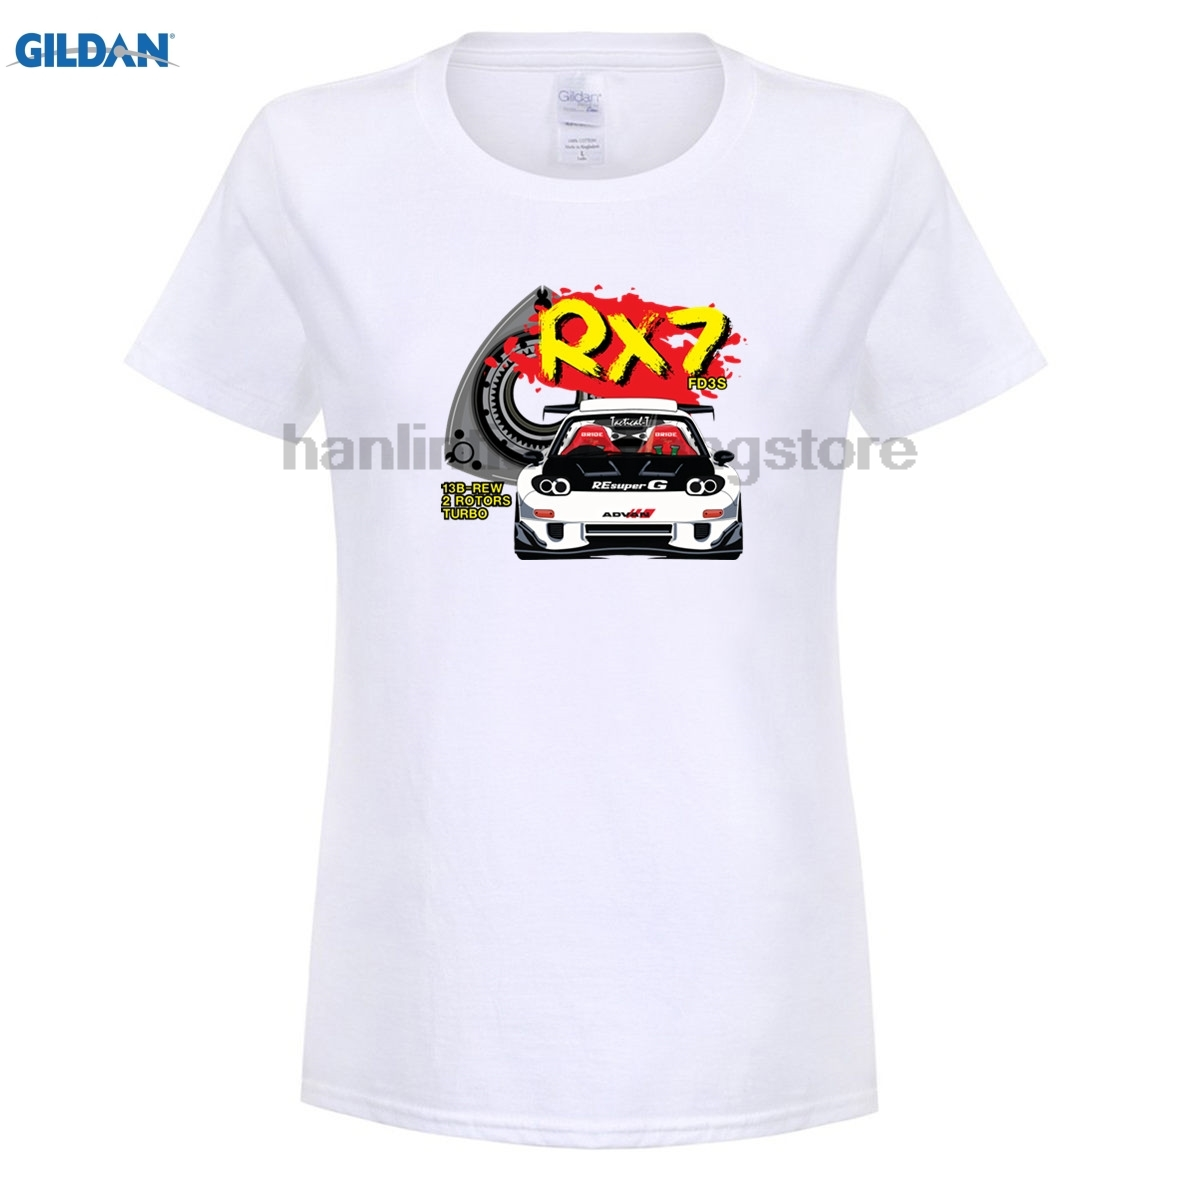 GILDAN 2018 women Summer Clothing 100% Cotton women t shirt High Quality turbo drift EVO GTR RX7 S2000Cotton T Shirt